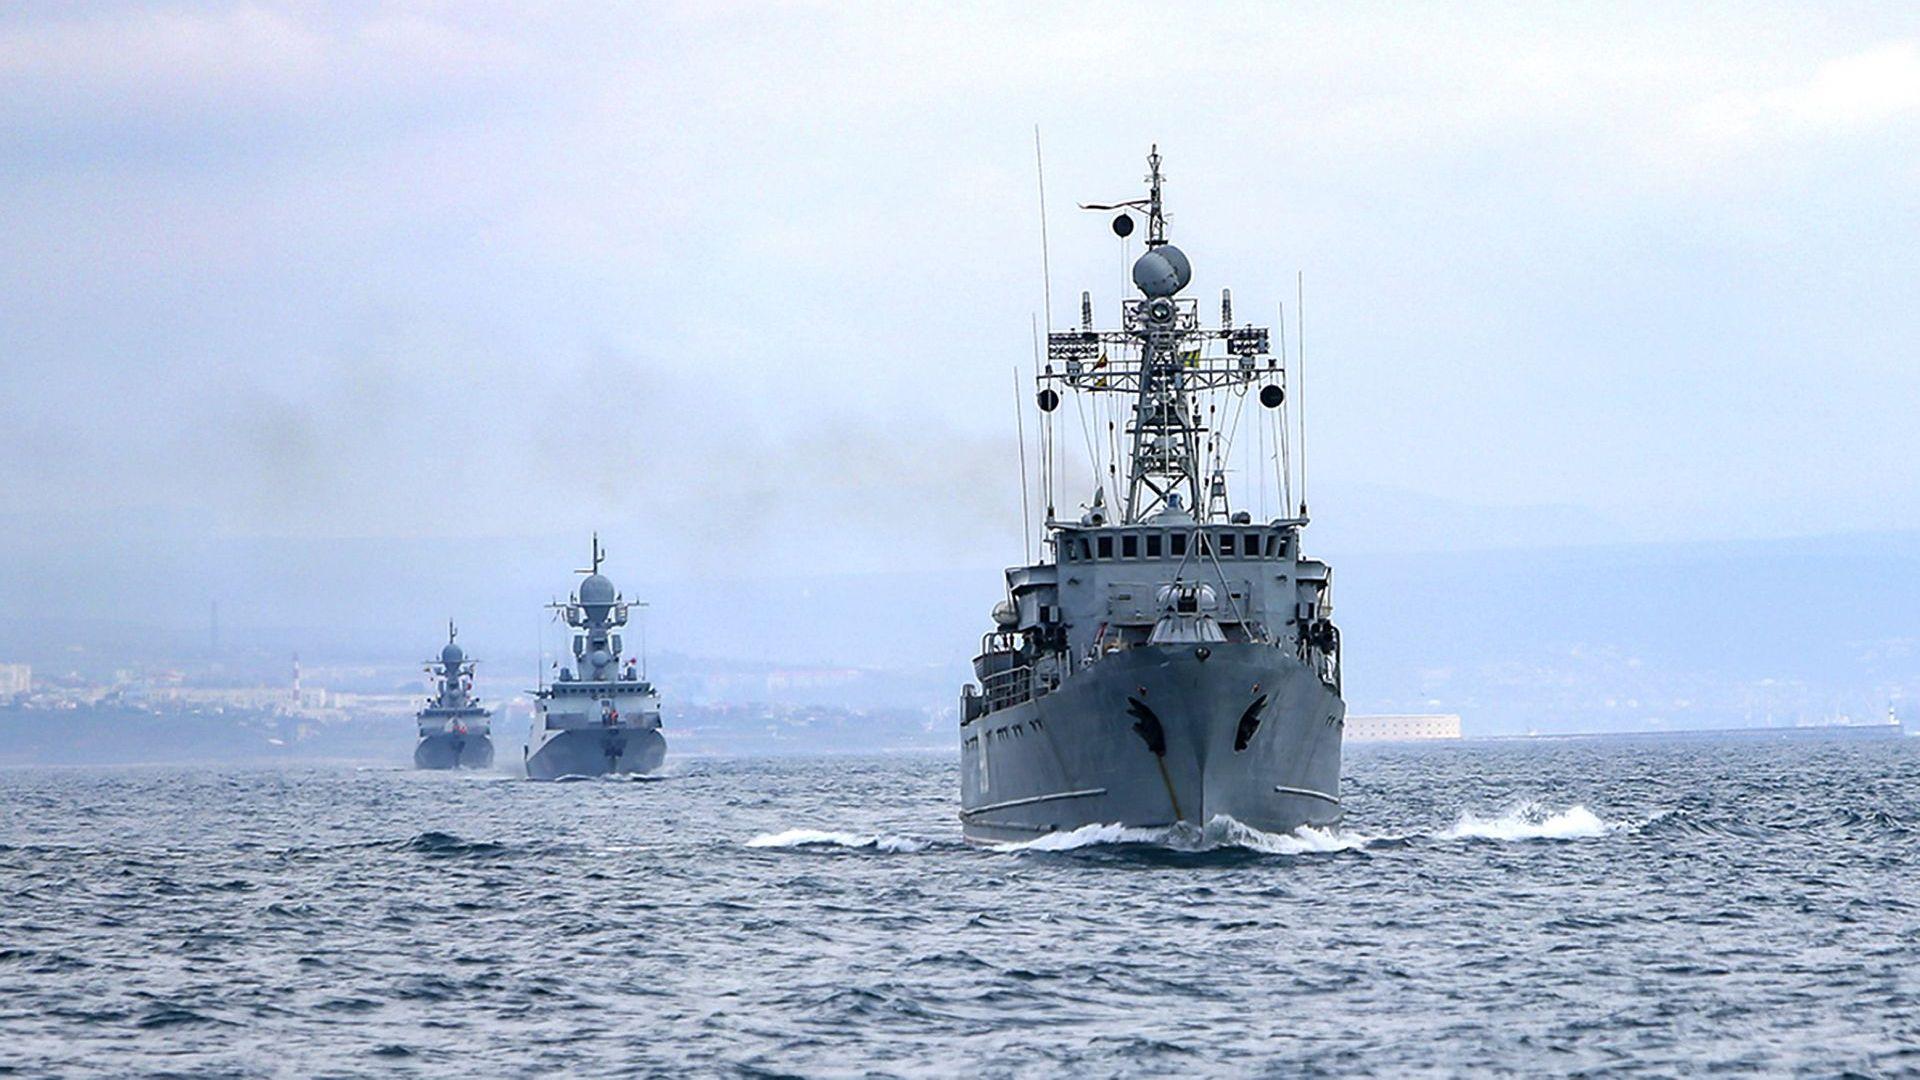 Пак напрежение в Черно море: US-кораб се насочва насам, Русия поднови военните учения